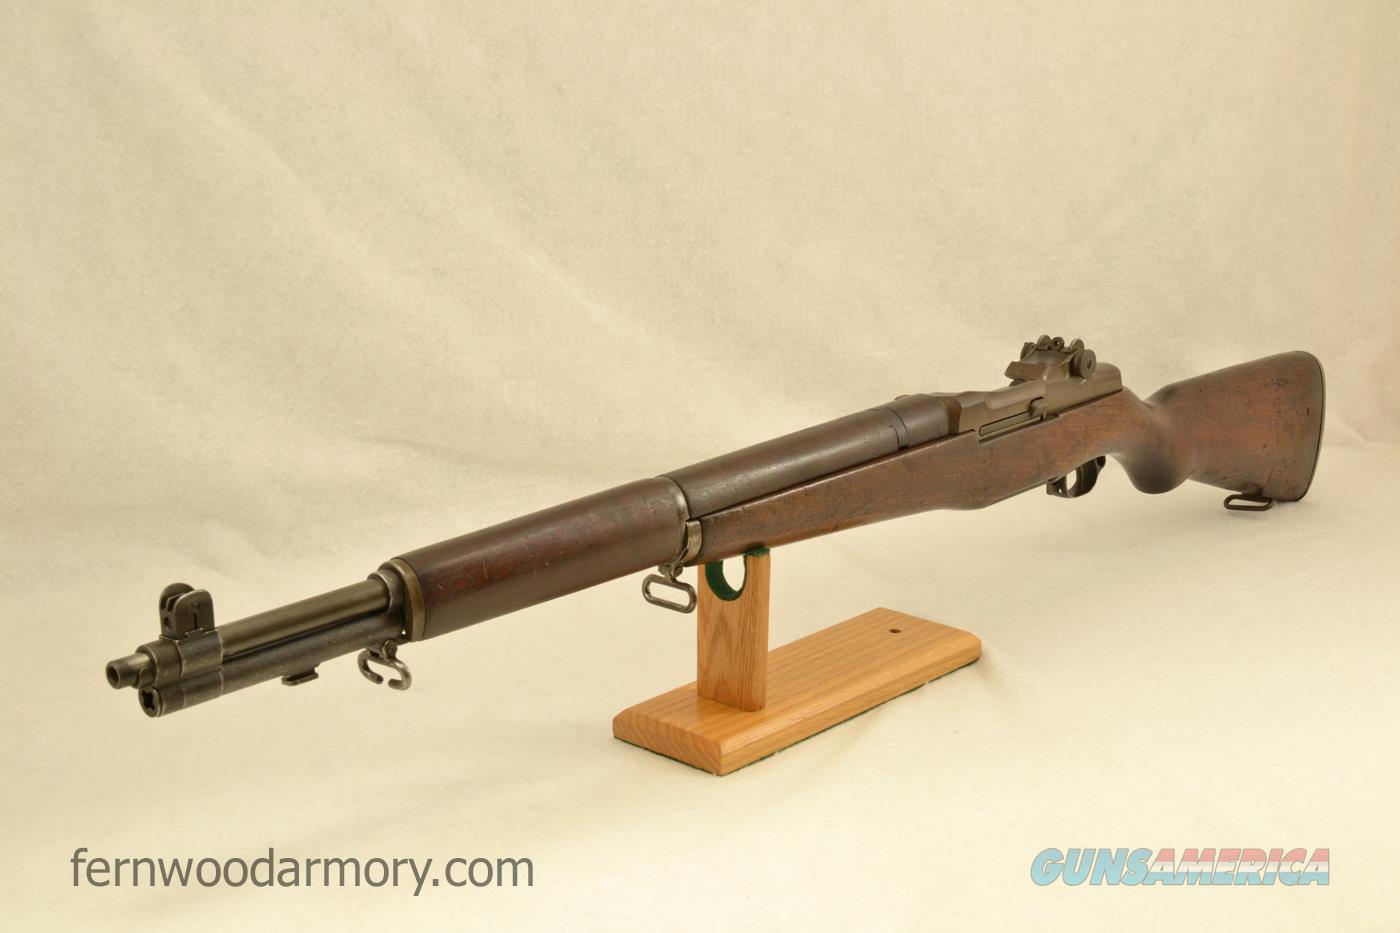 Winchester WIN-13 M1 Garand Made in 1945   Guns > Rifles > Military Misc. Rifles US > M1 Garand